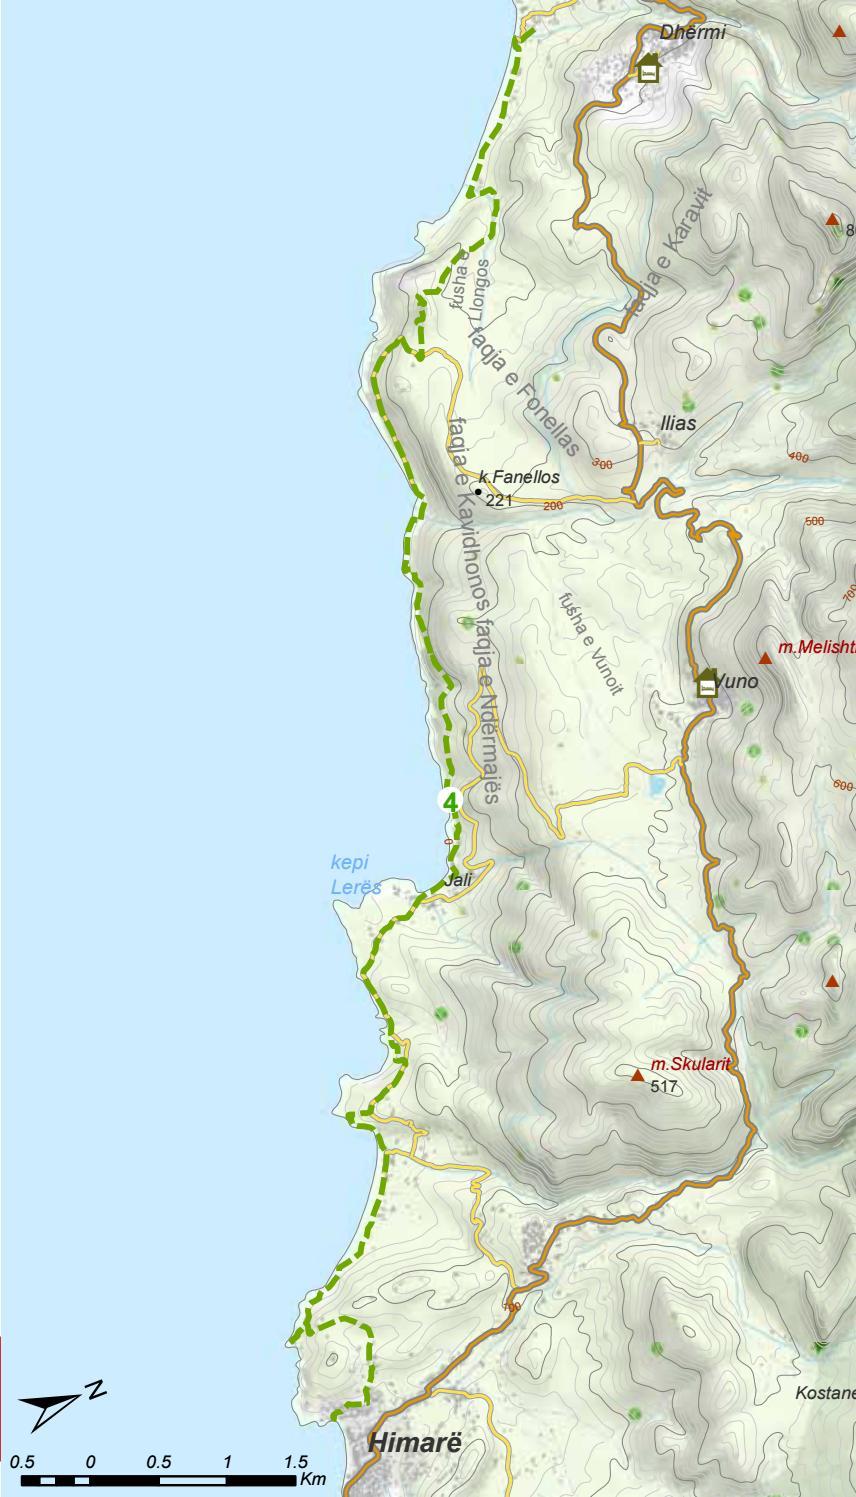 Hiking Trails in Himara Region page 45